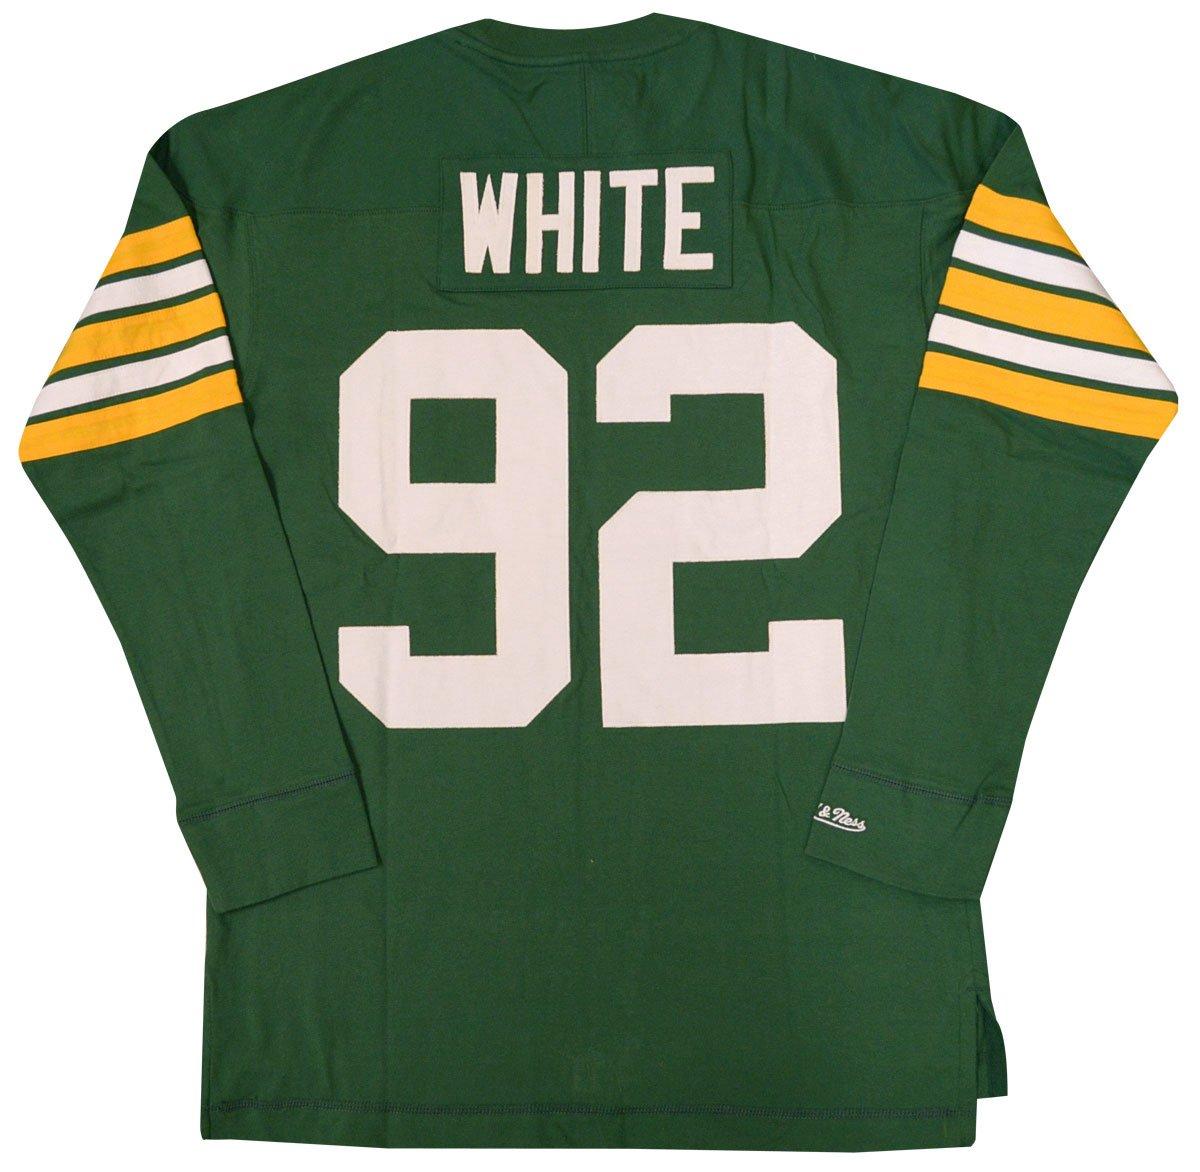 6e584b5bec6 Amazon.com : Mitchell & Ness Reggie White Green Bay Packers Name & Number  Longsleeve Tee : Clothing